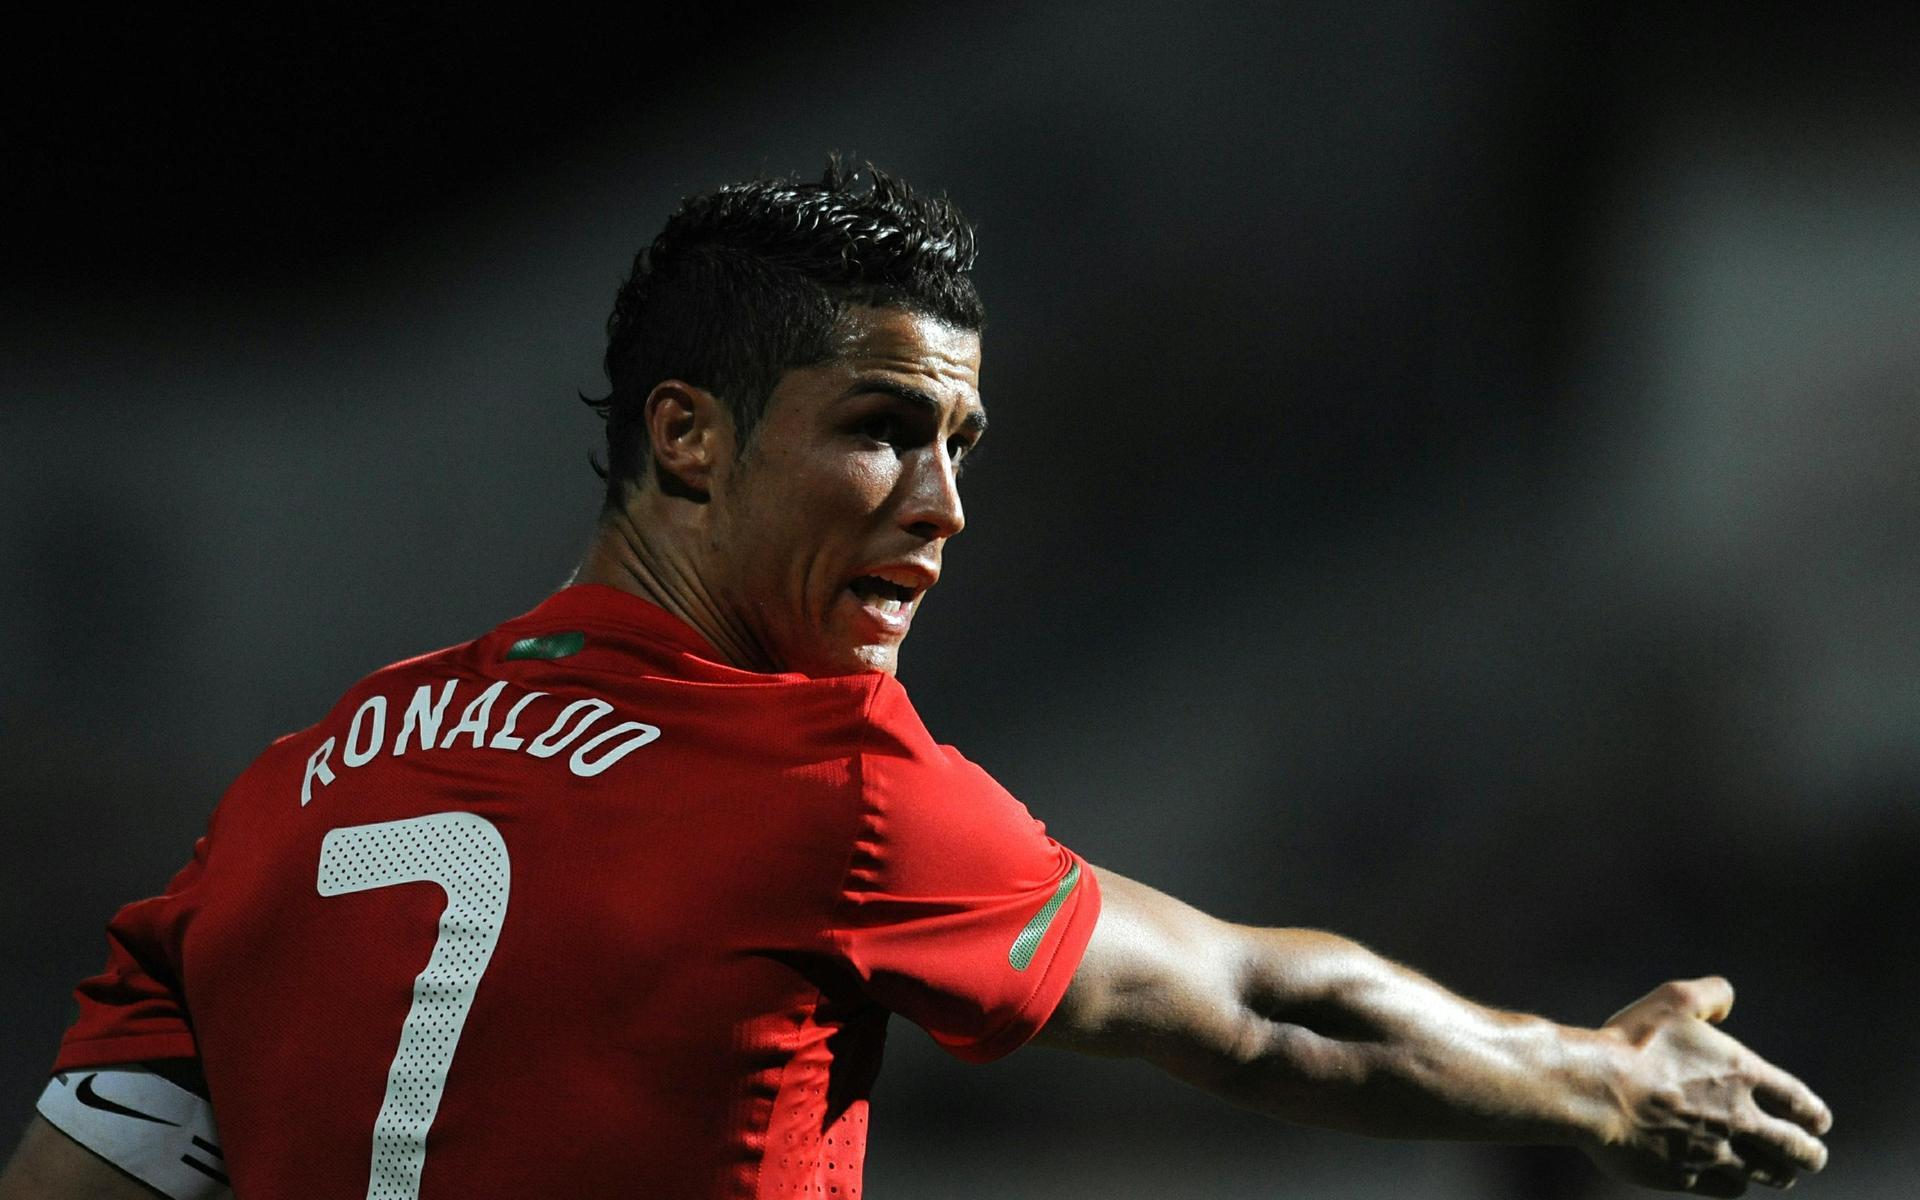 Hd wallpaper ronaldo - Portugal Captain Cristiano Ronaldo Wallpaper Wide Wallpaper With